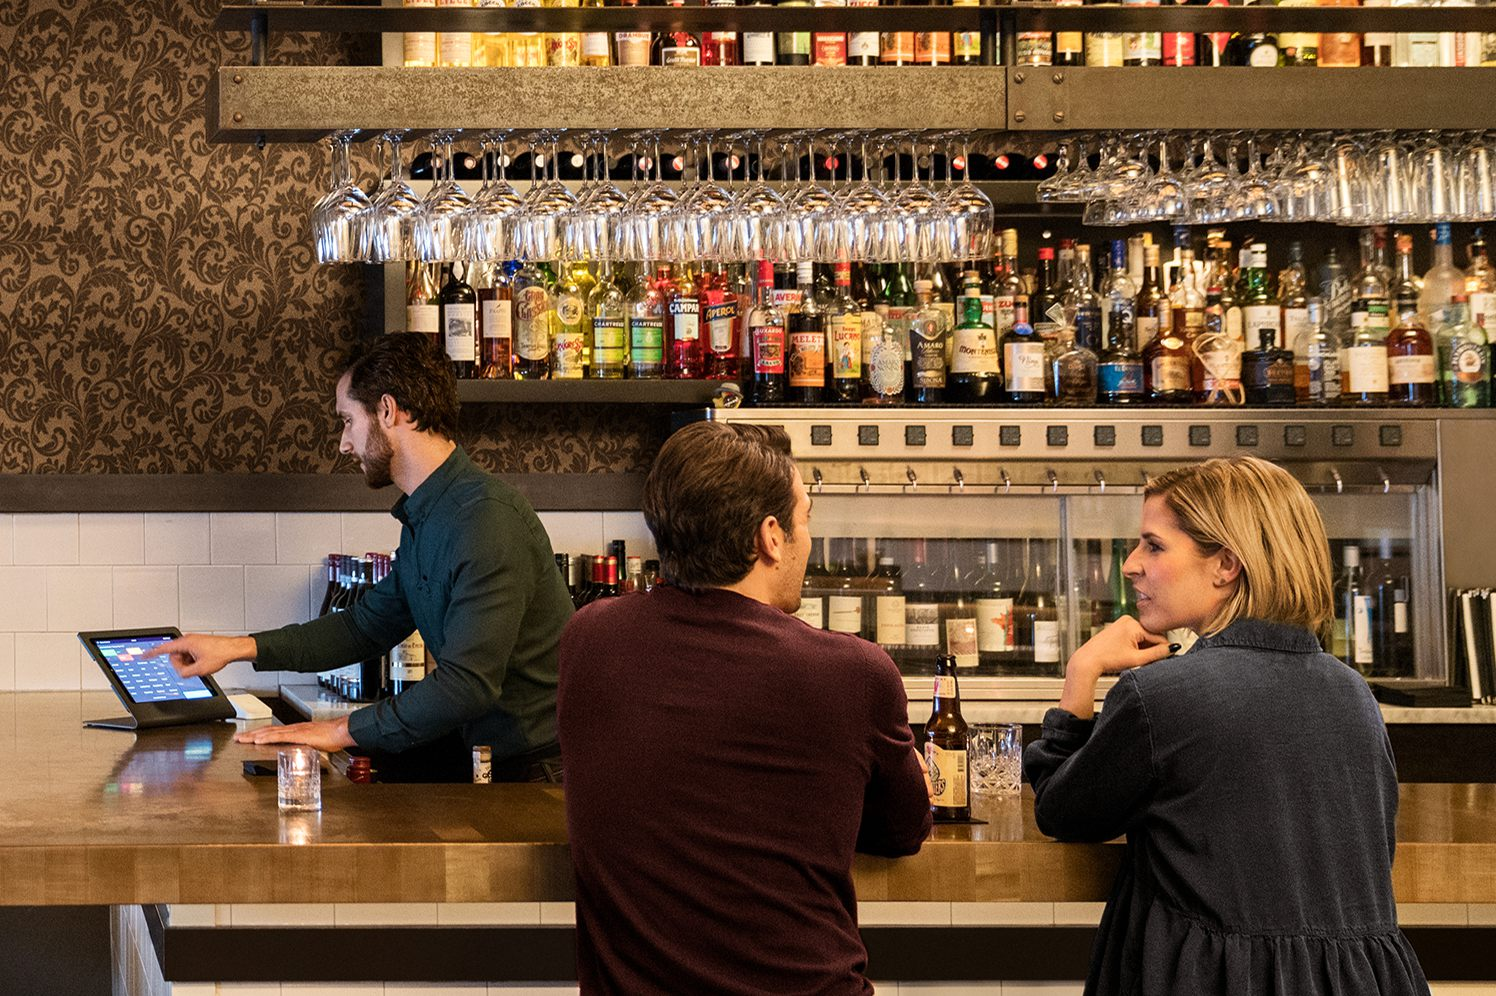 tip pooling at a bar